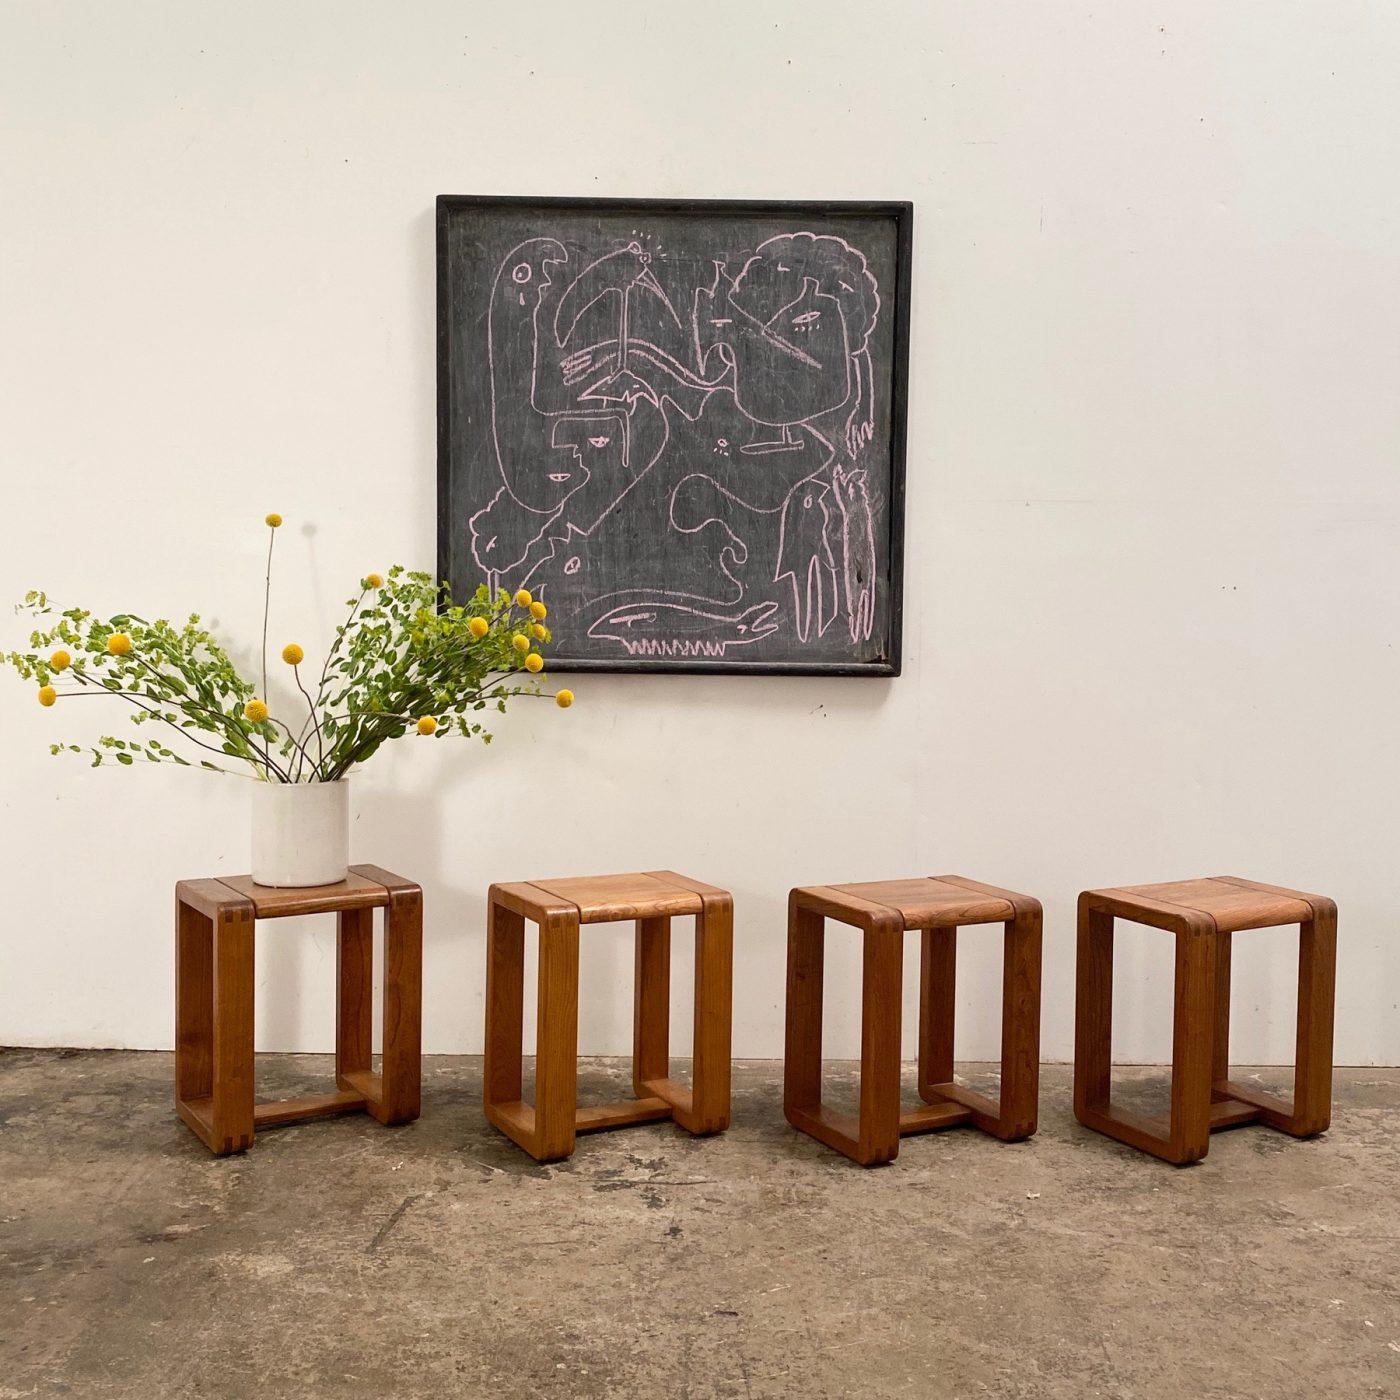 objet-vagabond-massive-stools0004